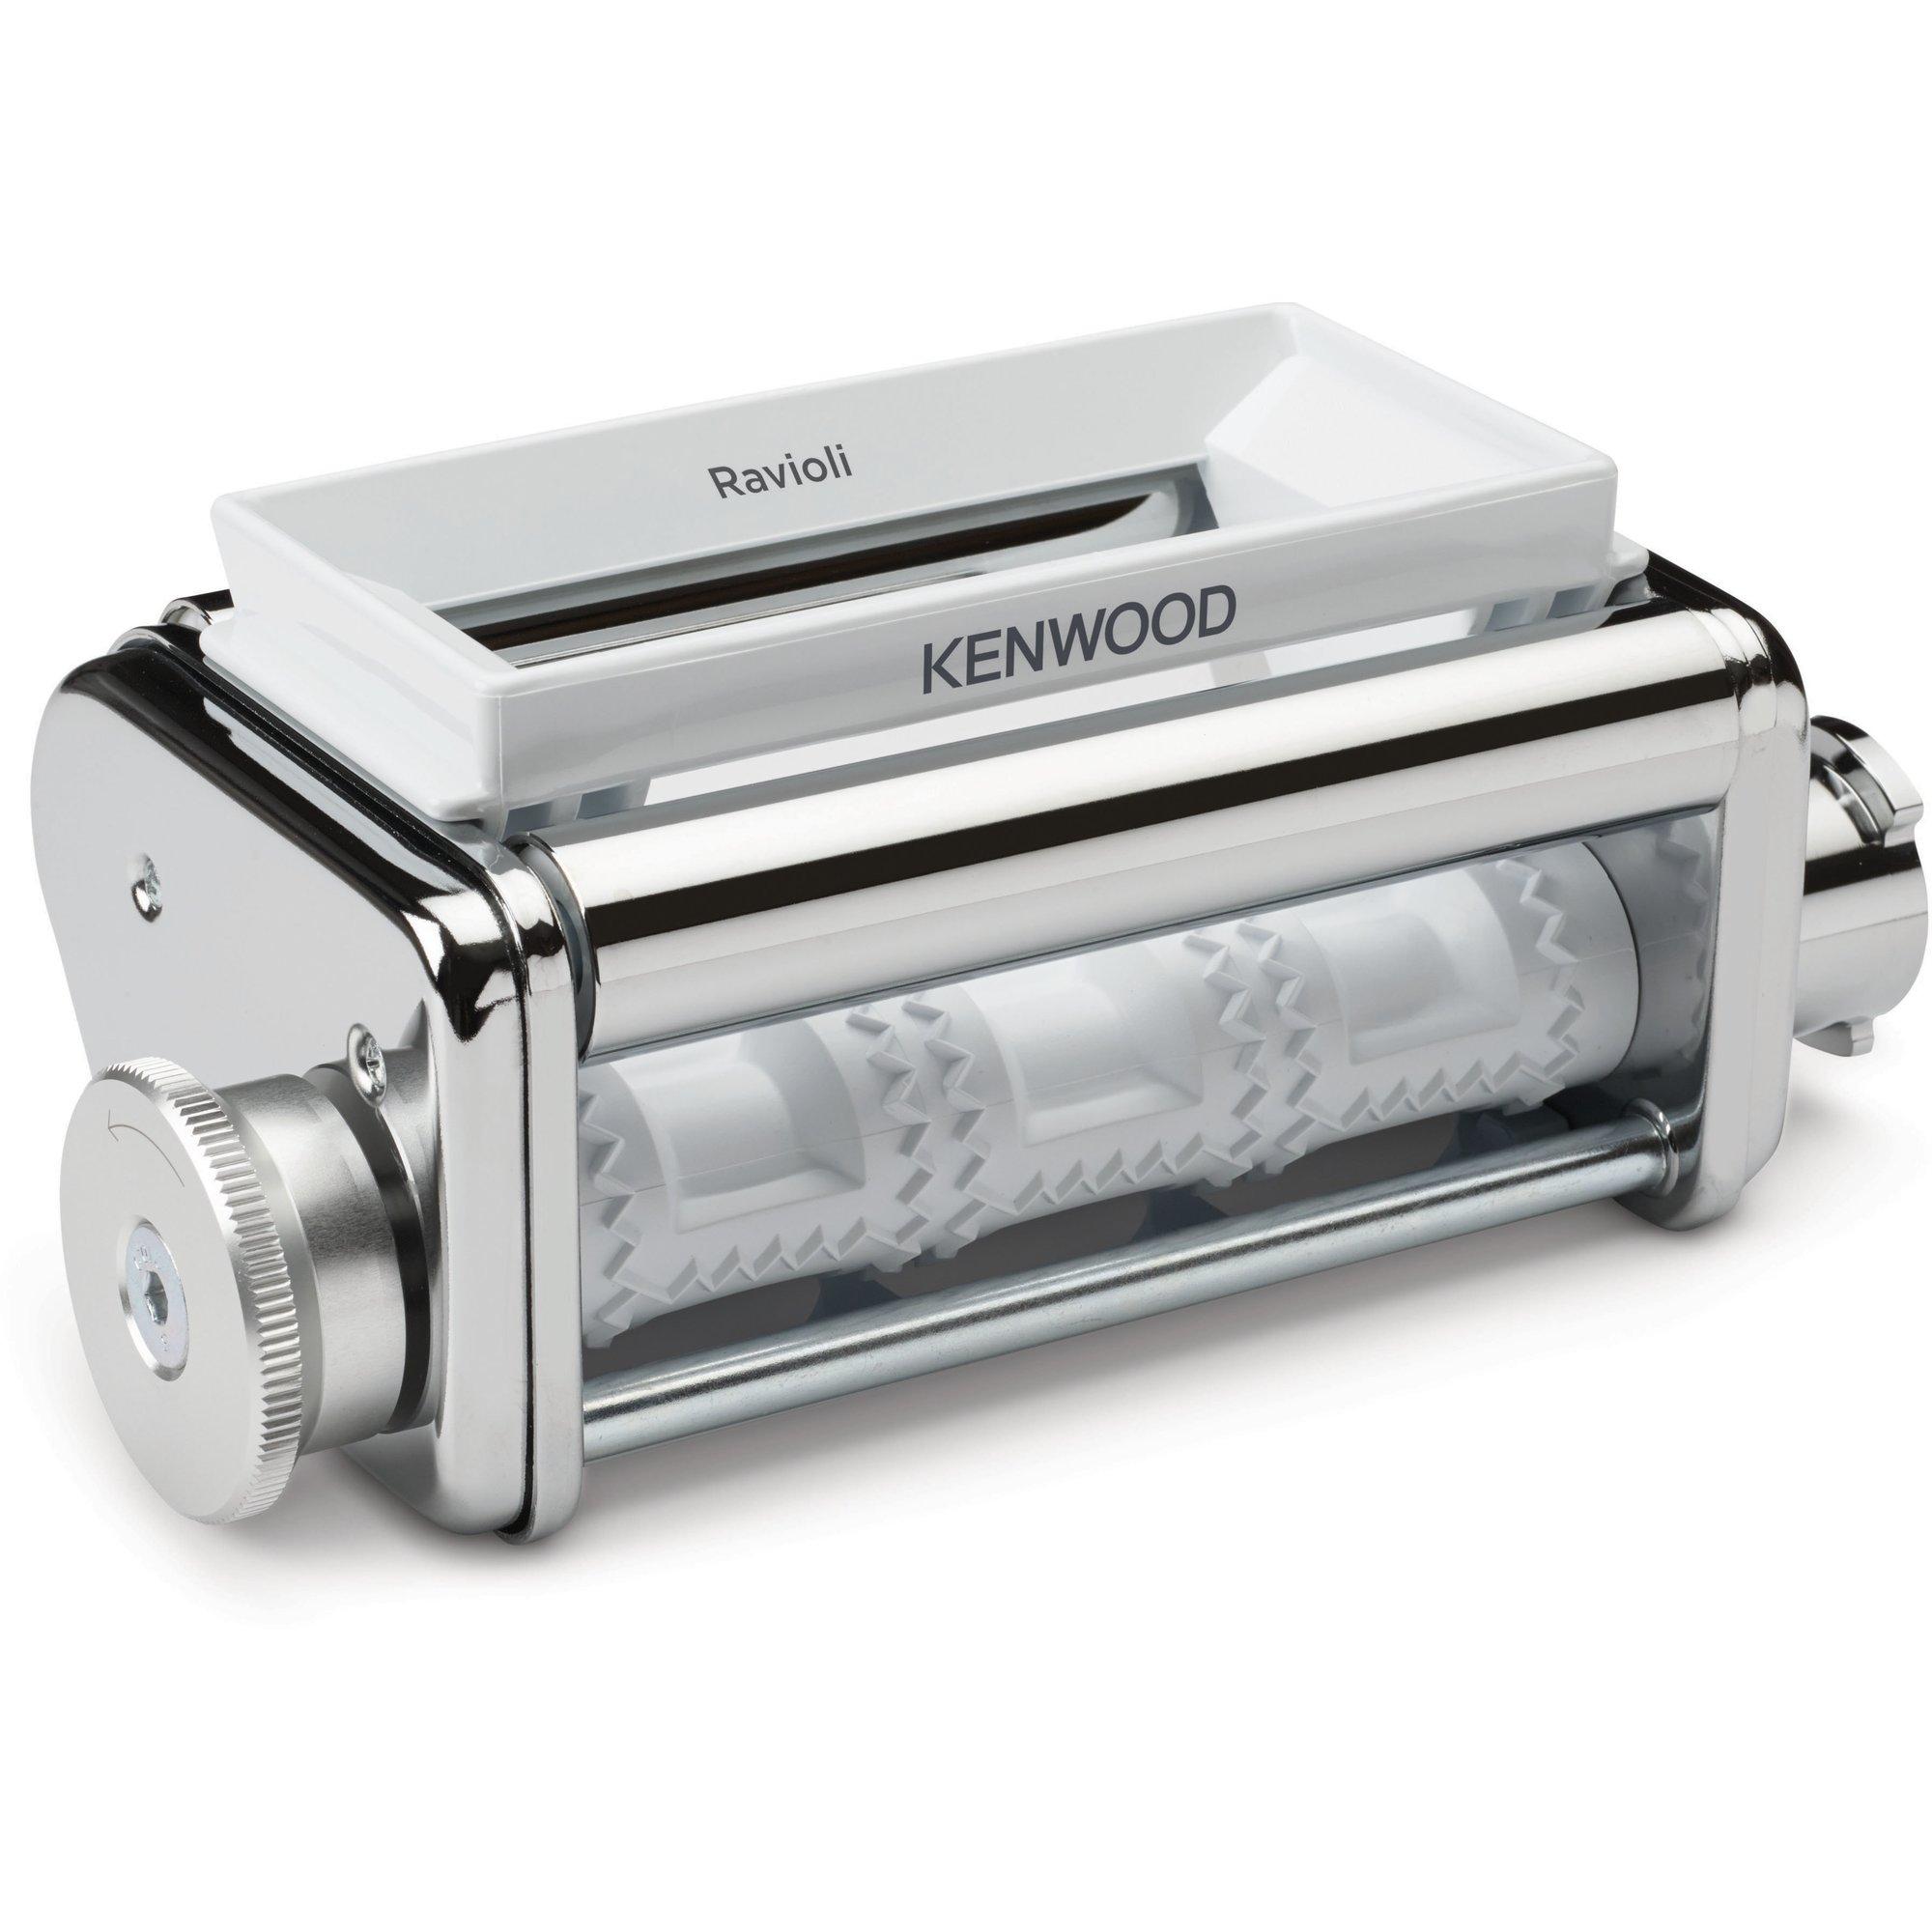 Kenwood KAX93.A0ME Ravioli Maker